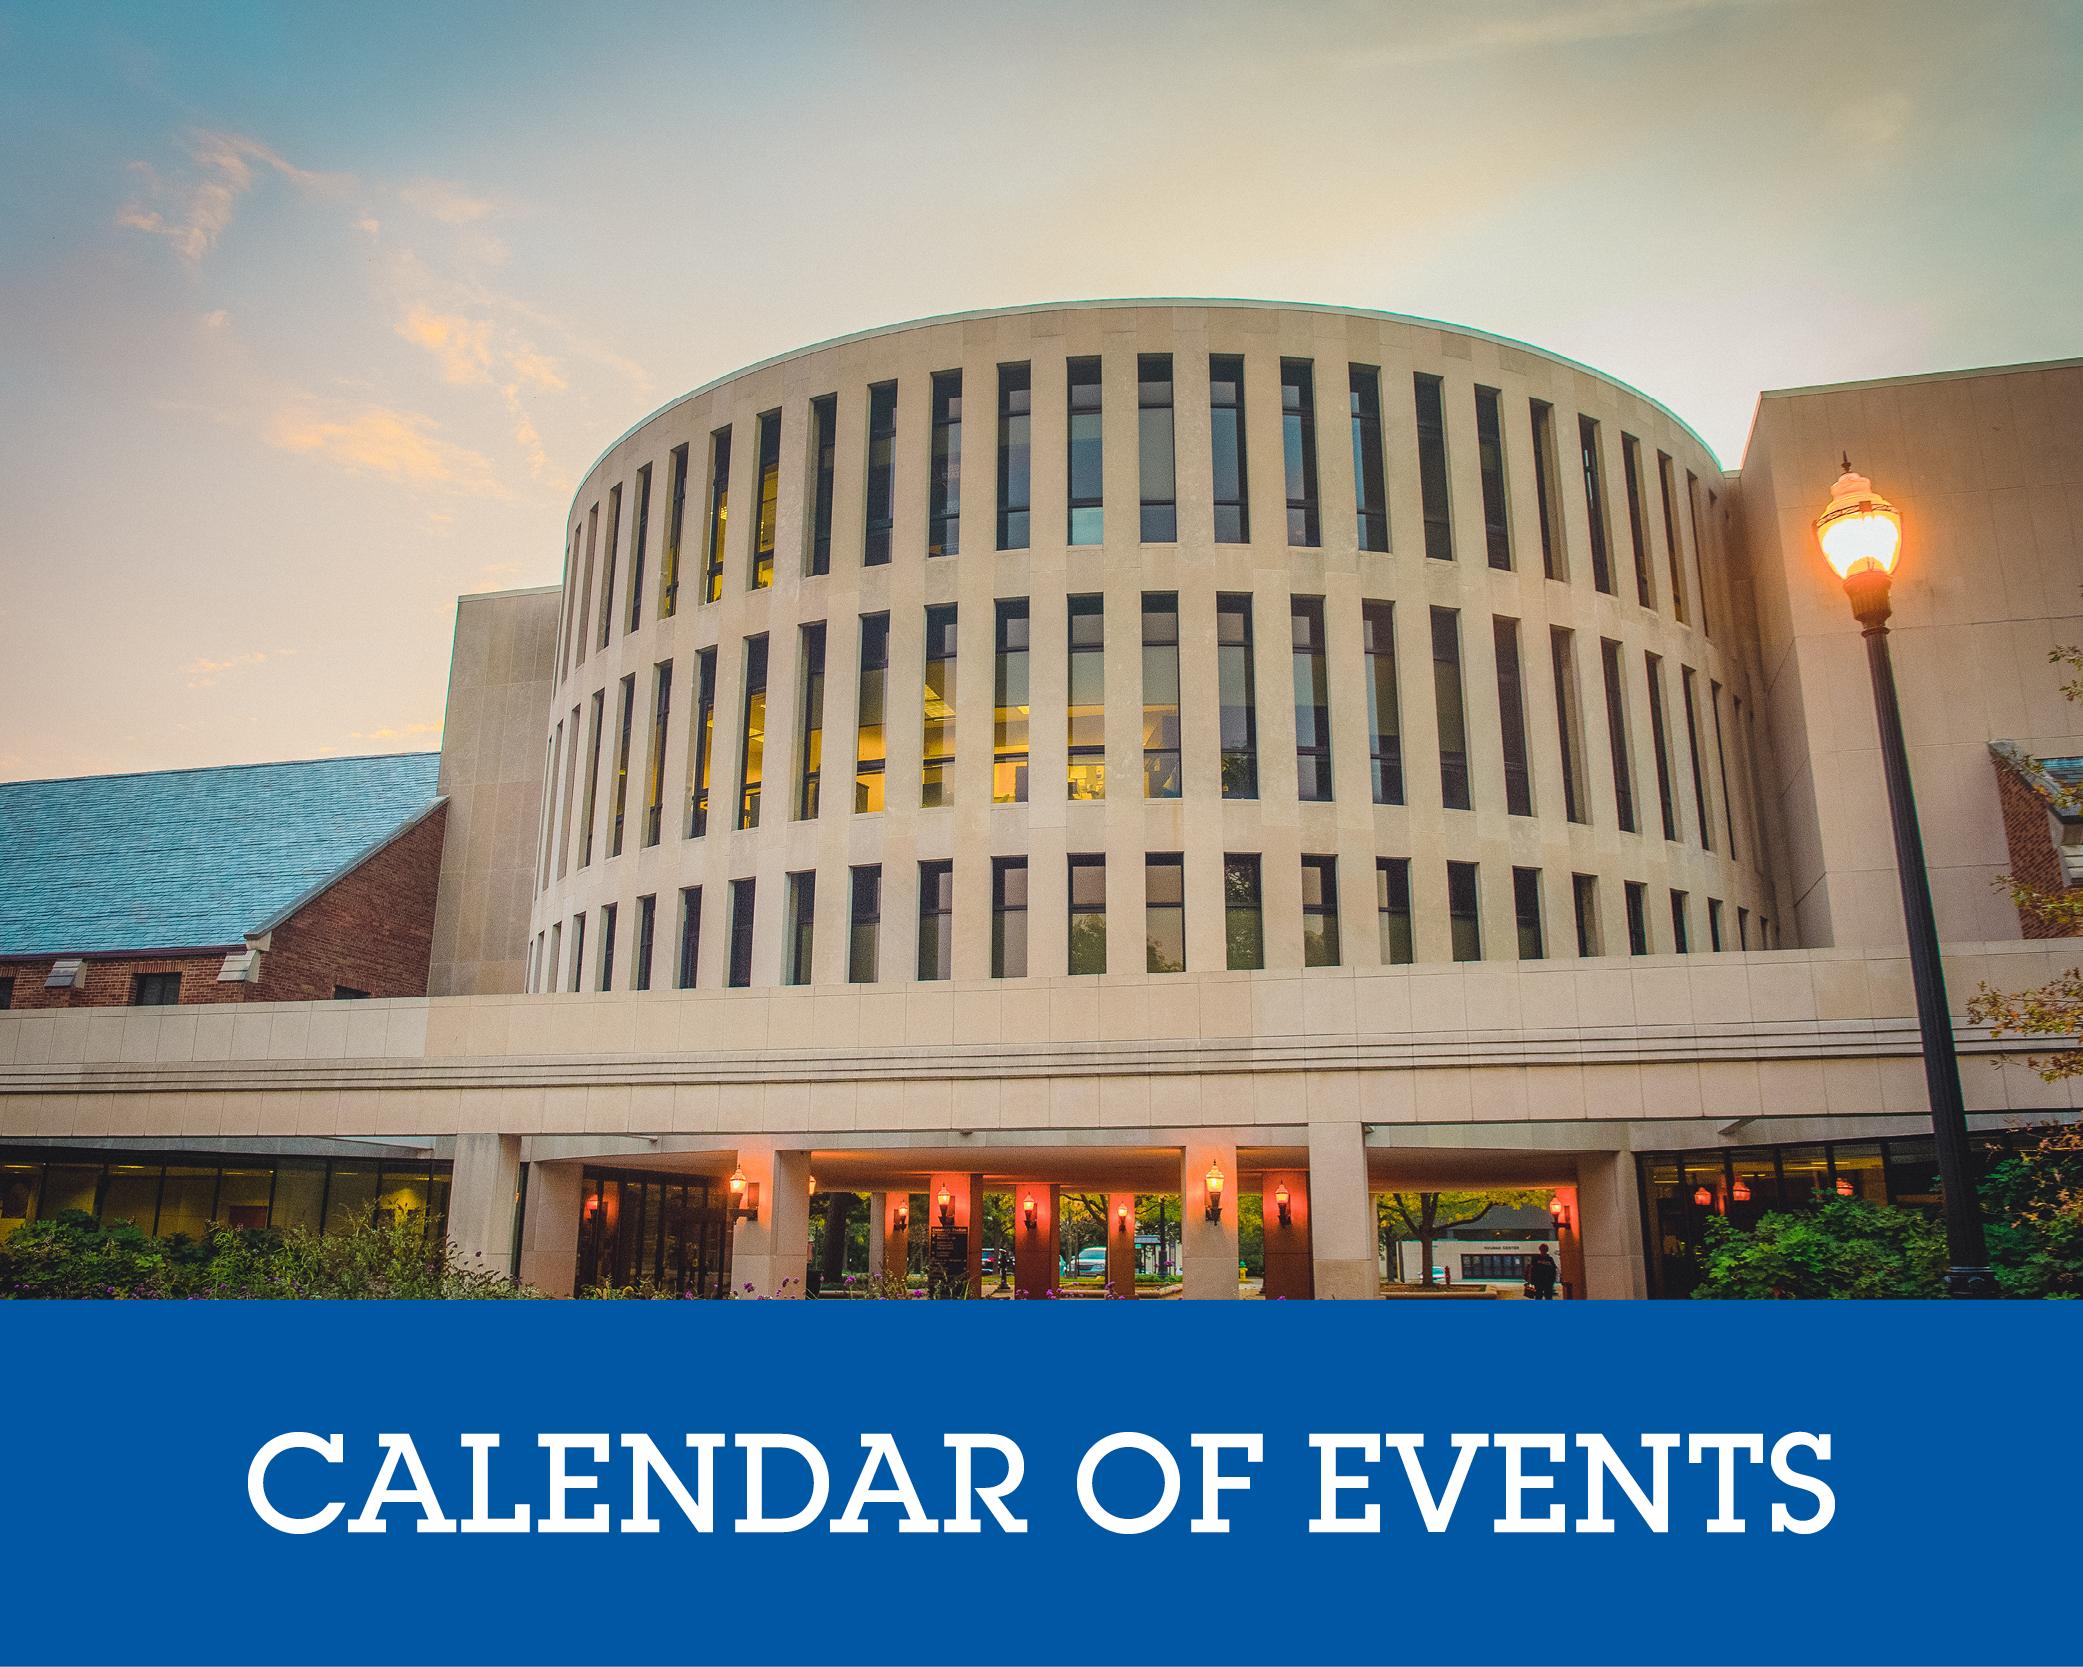 calendar-of-events.png